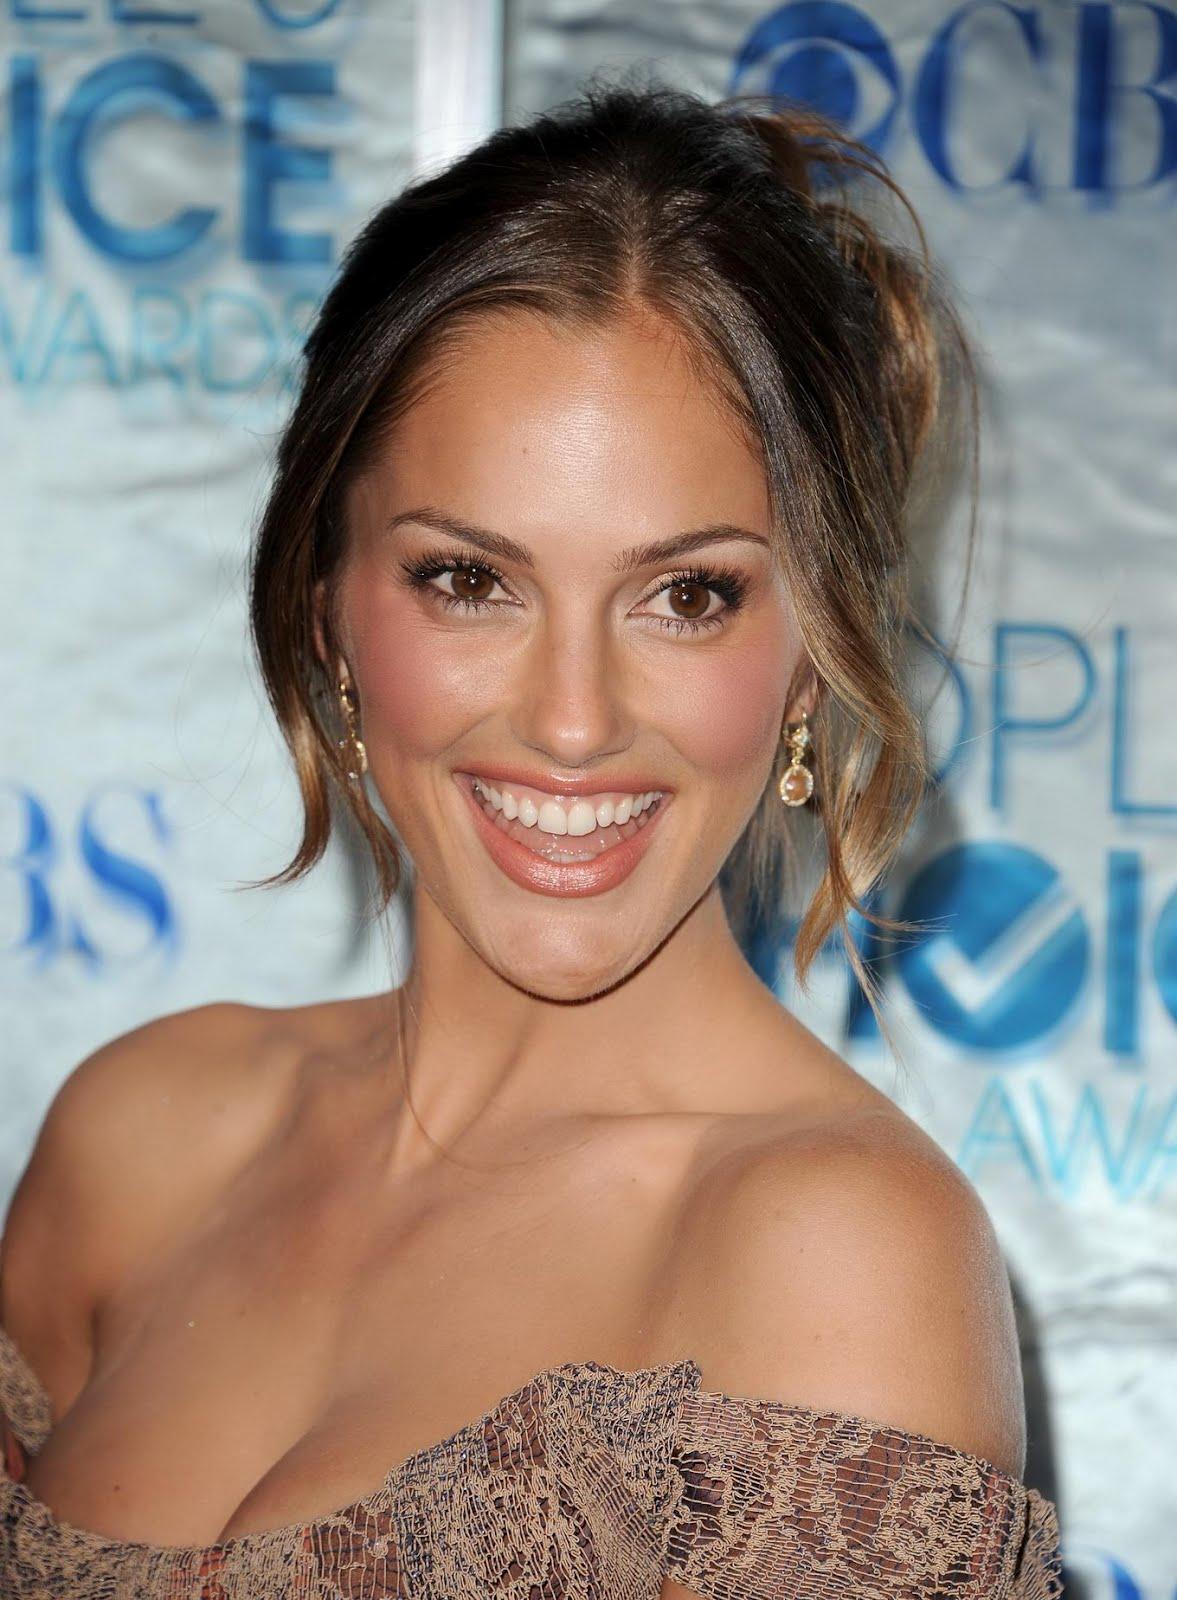 Kelly minka sexiest woman alive really. was